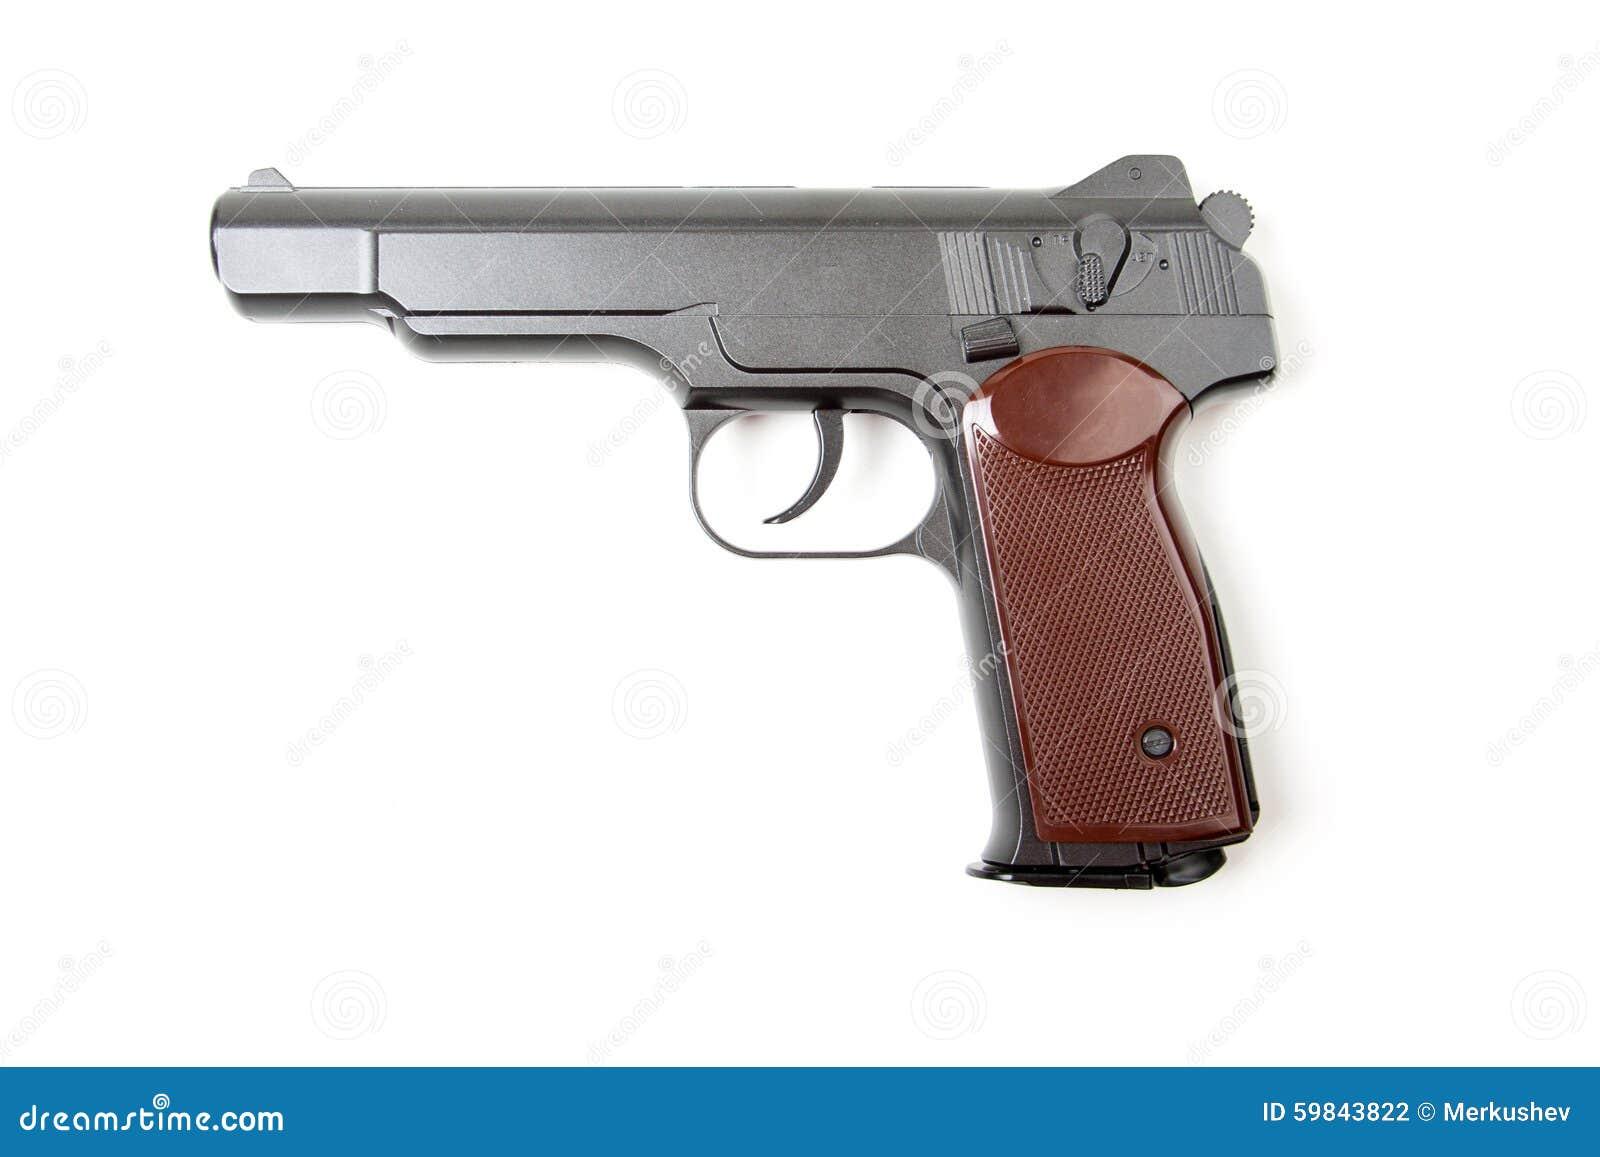 gun white background - photo #48